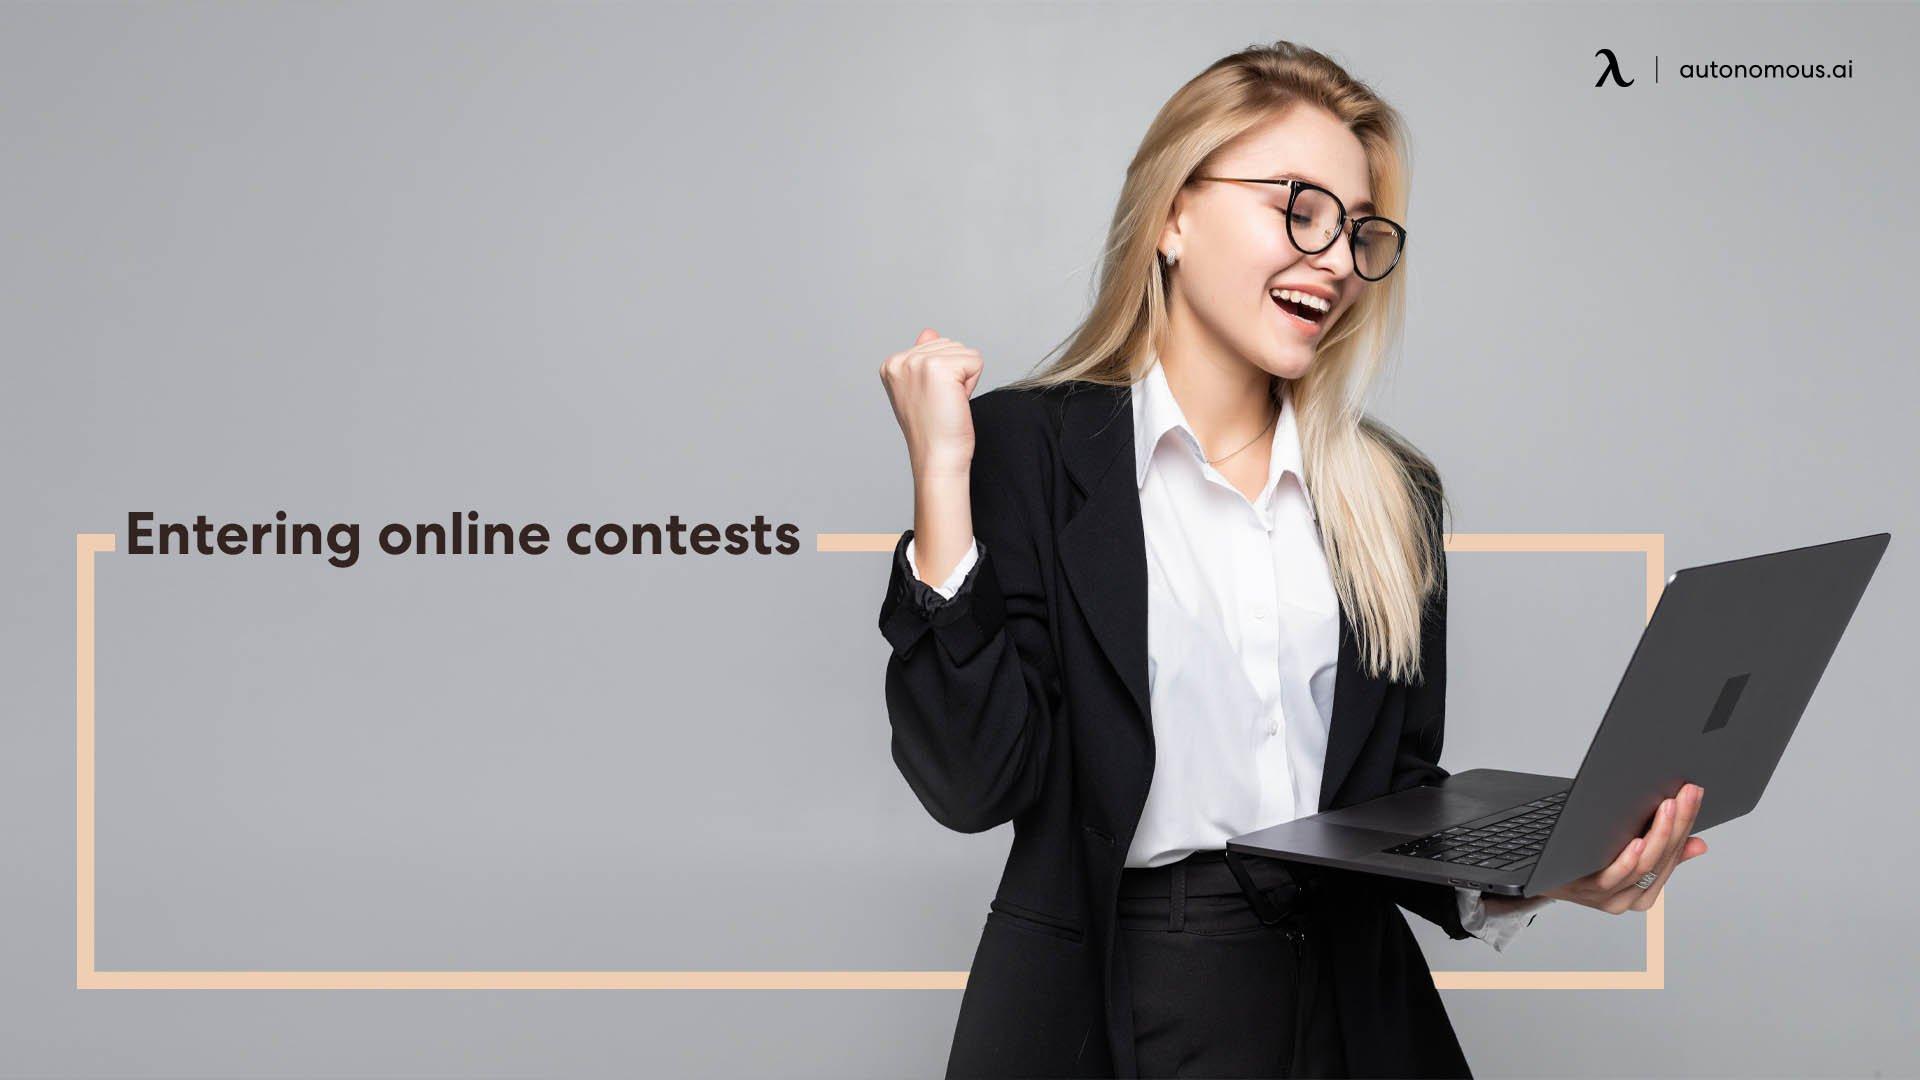 Entering online contests